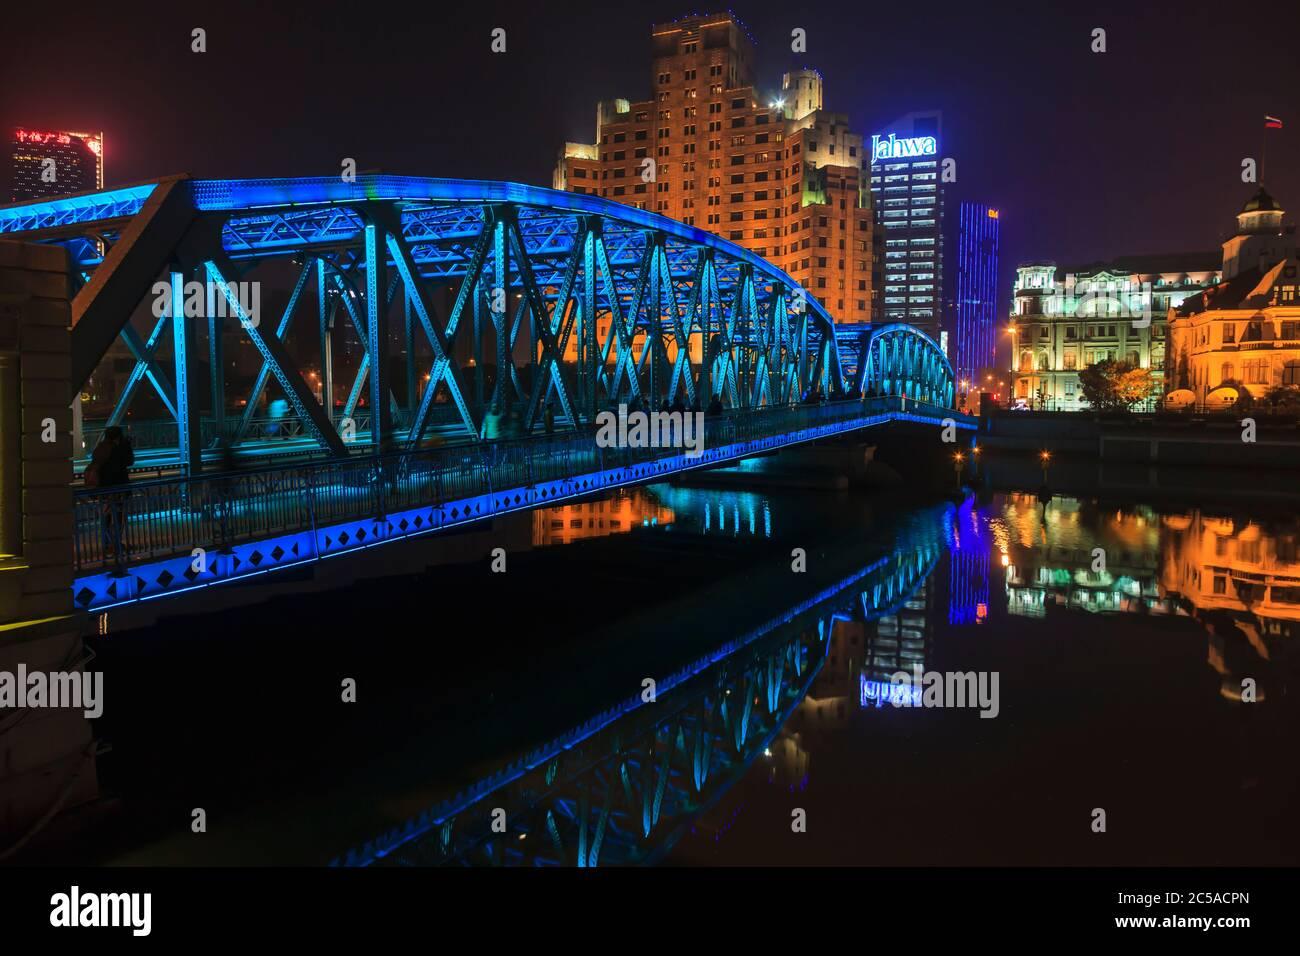 View on colorful illuminated Waibaidu bridge in Shanghai at night Stock Photo